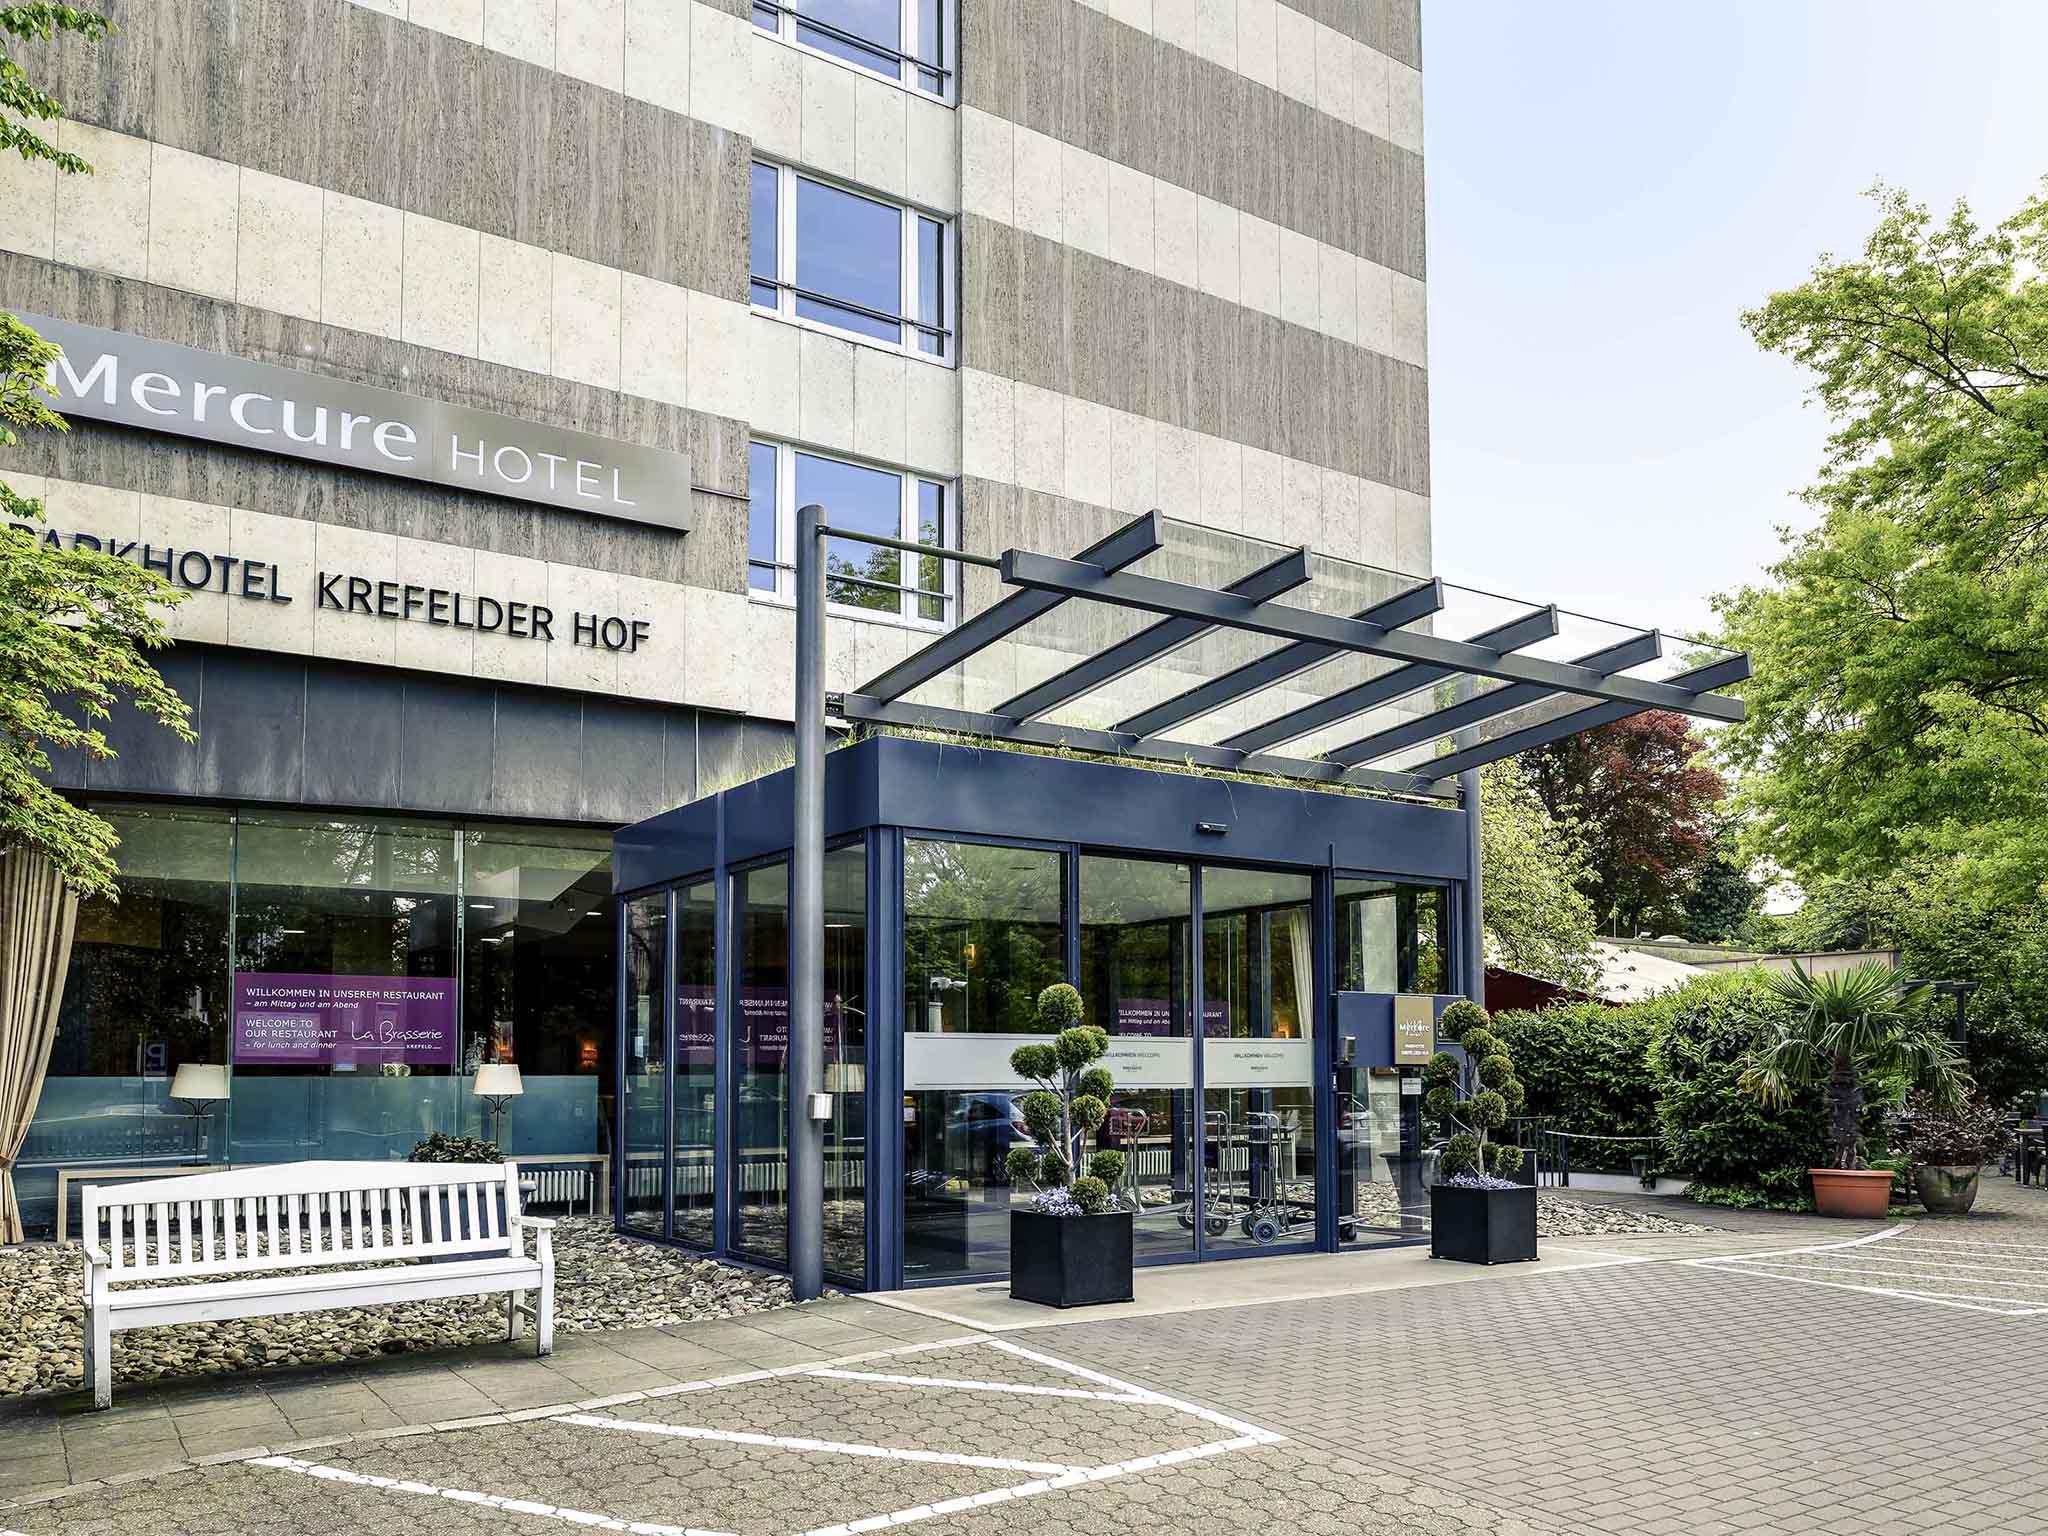 Hotel - Mercure Parkhotel Krefelder Hof